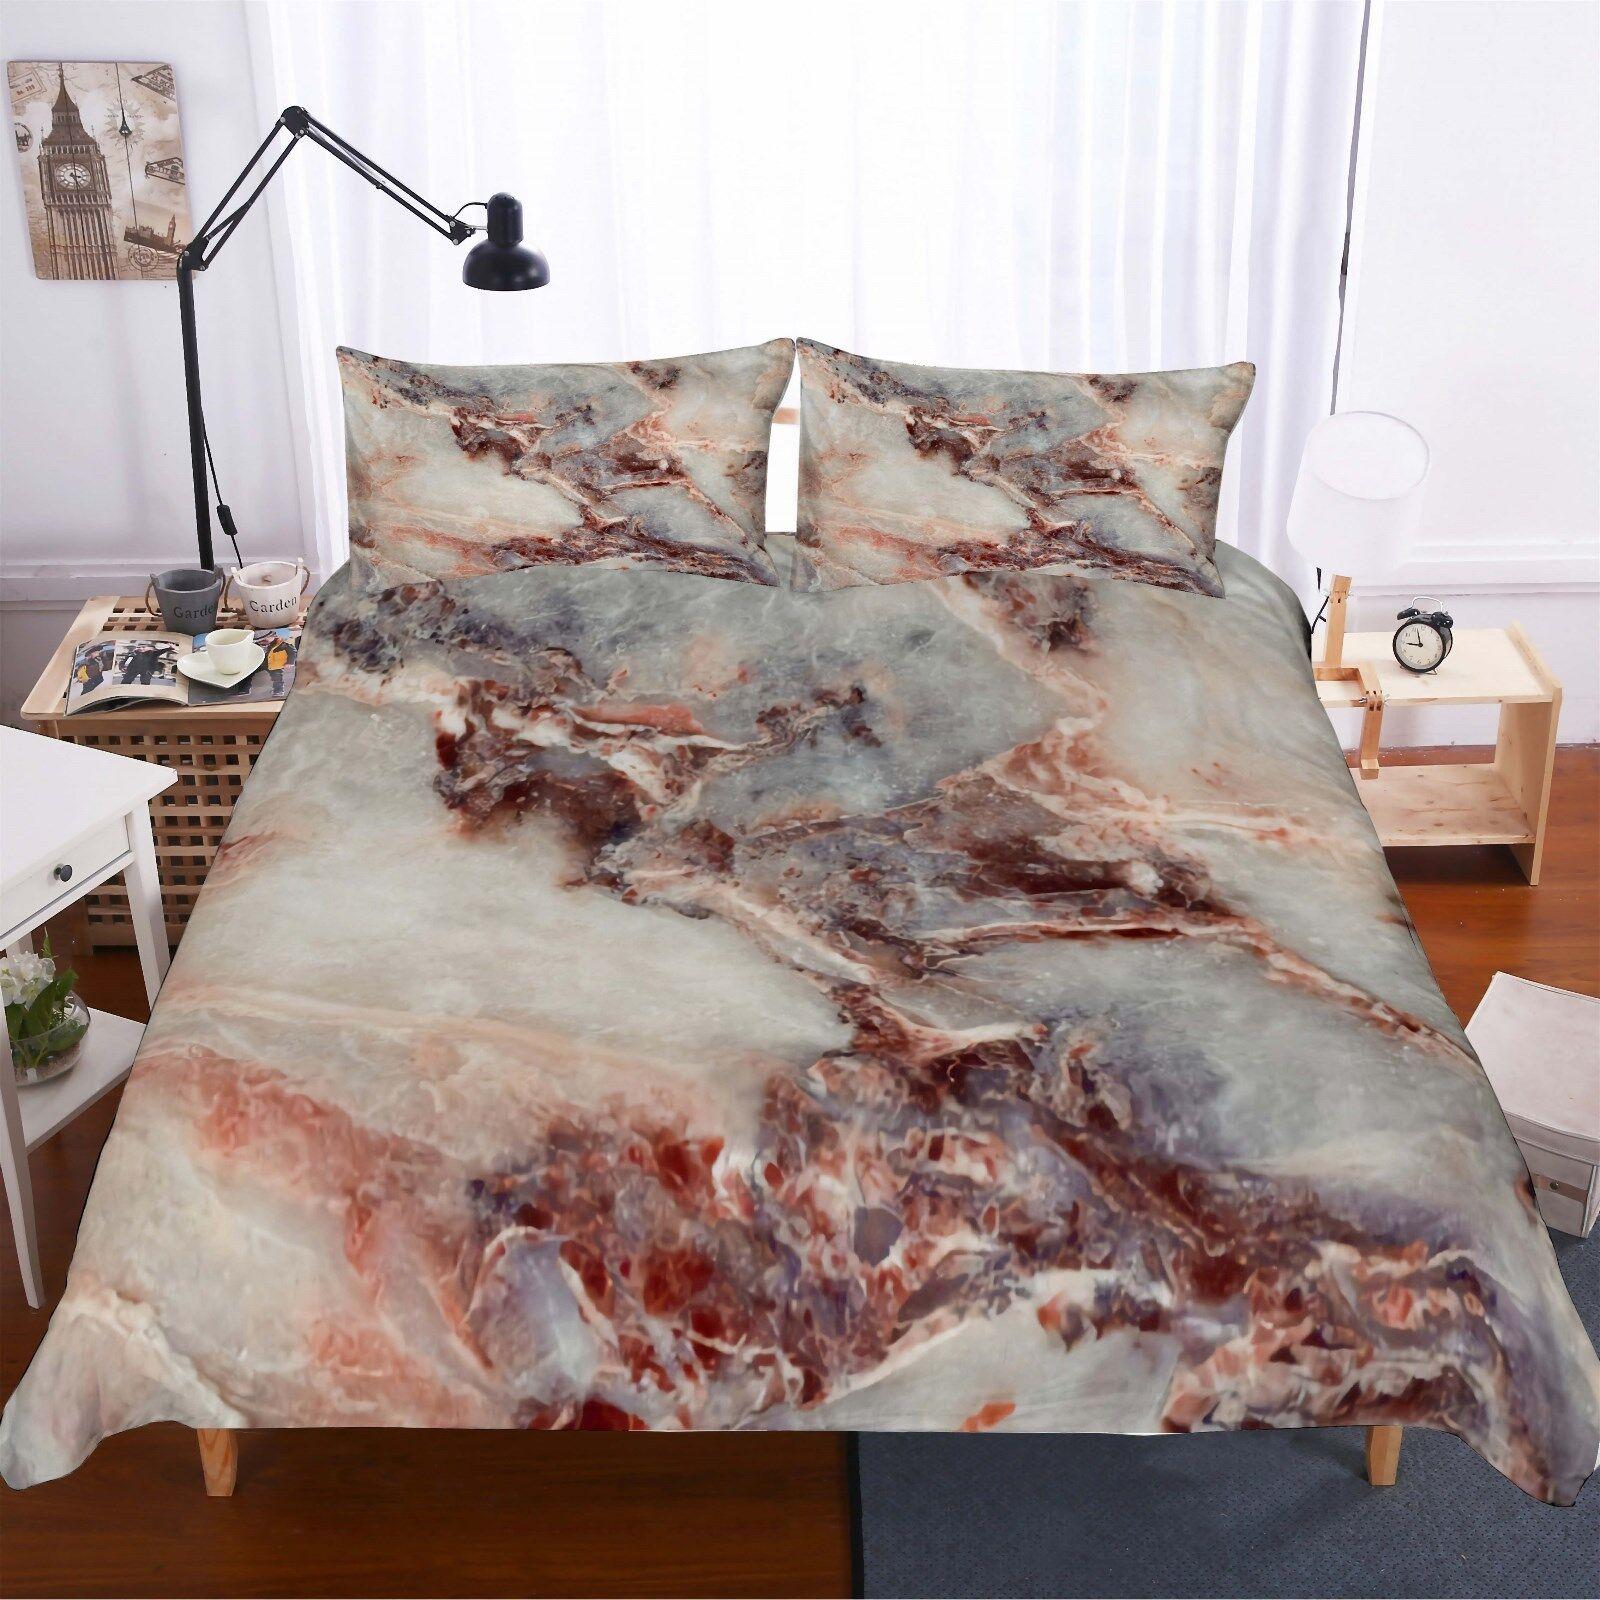 3D Marble Pattern Bedding Set Duvet Cover Comforter Cover Pillow Case Hkm15